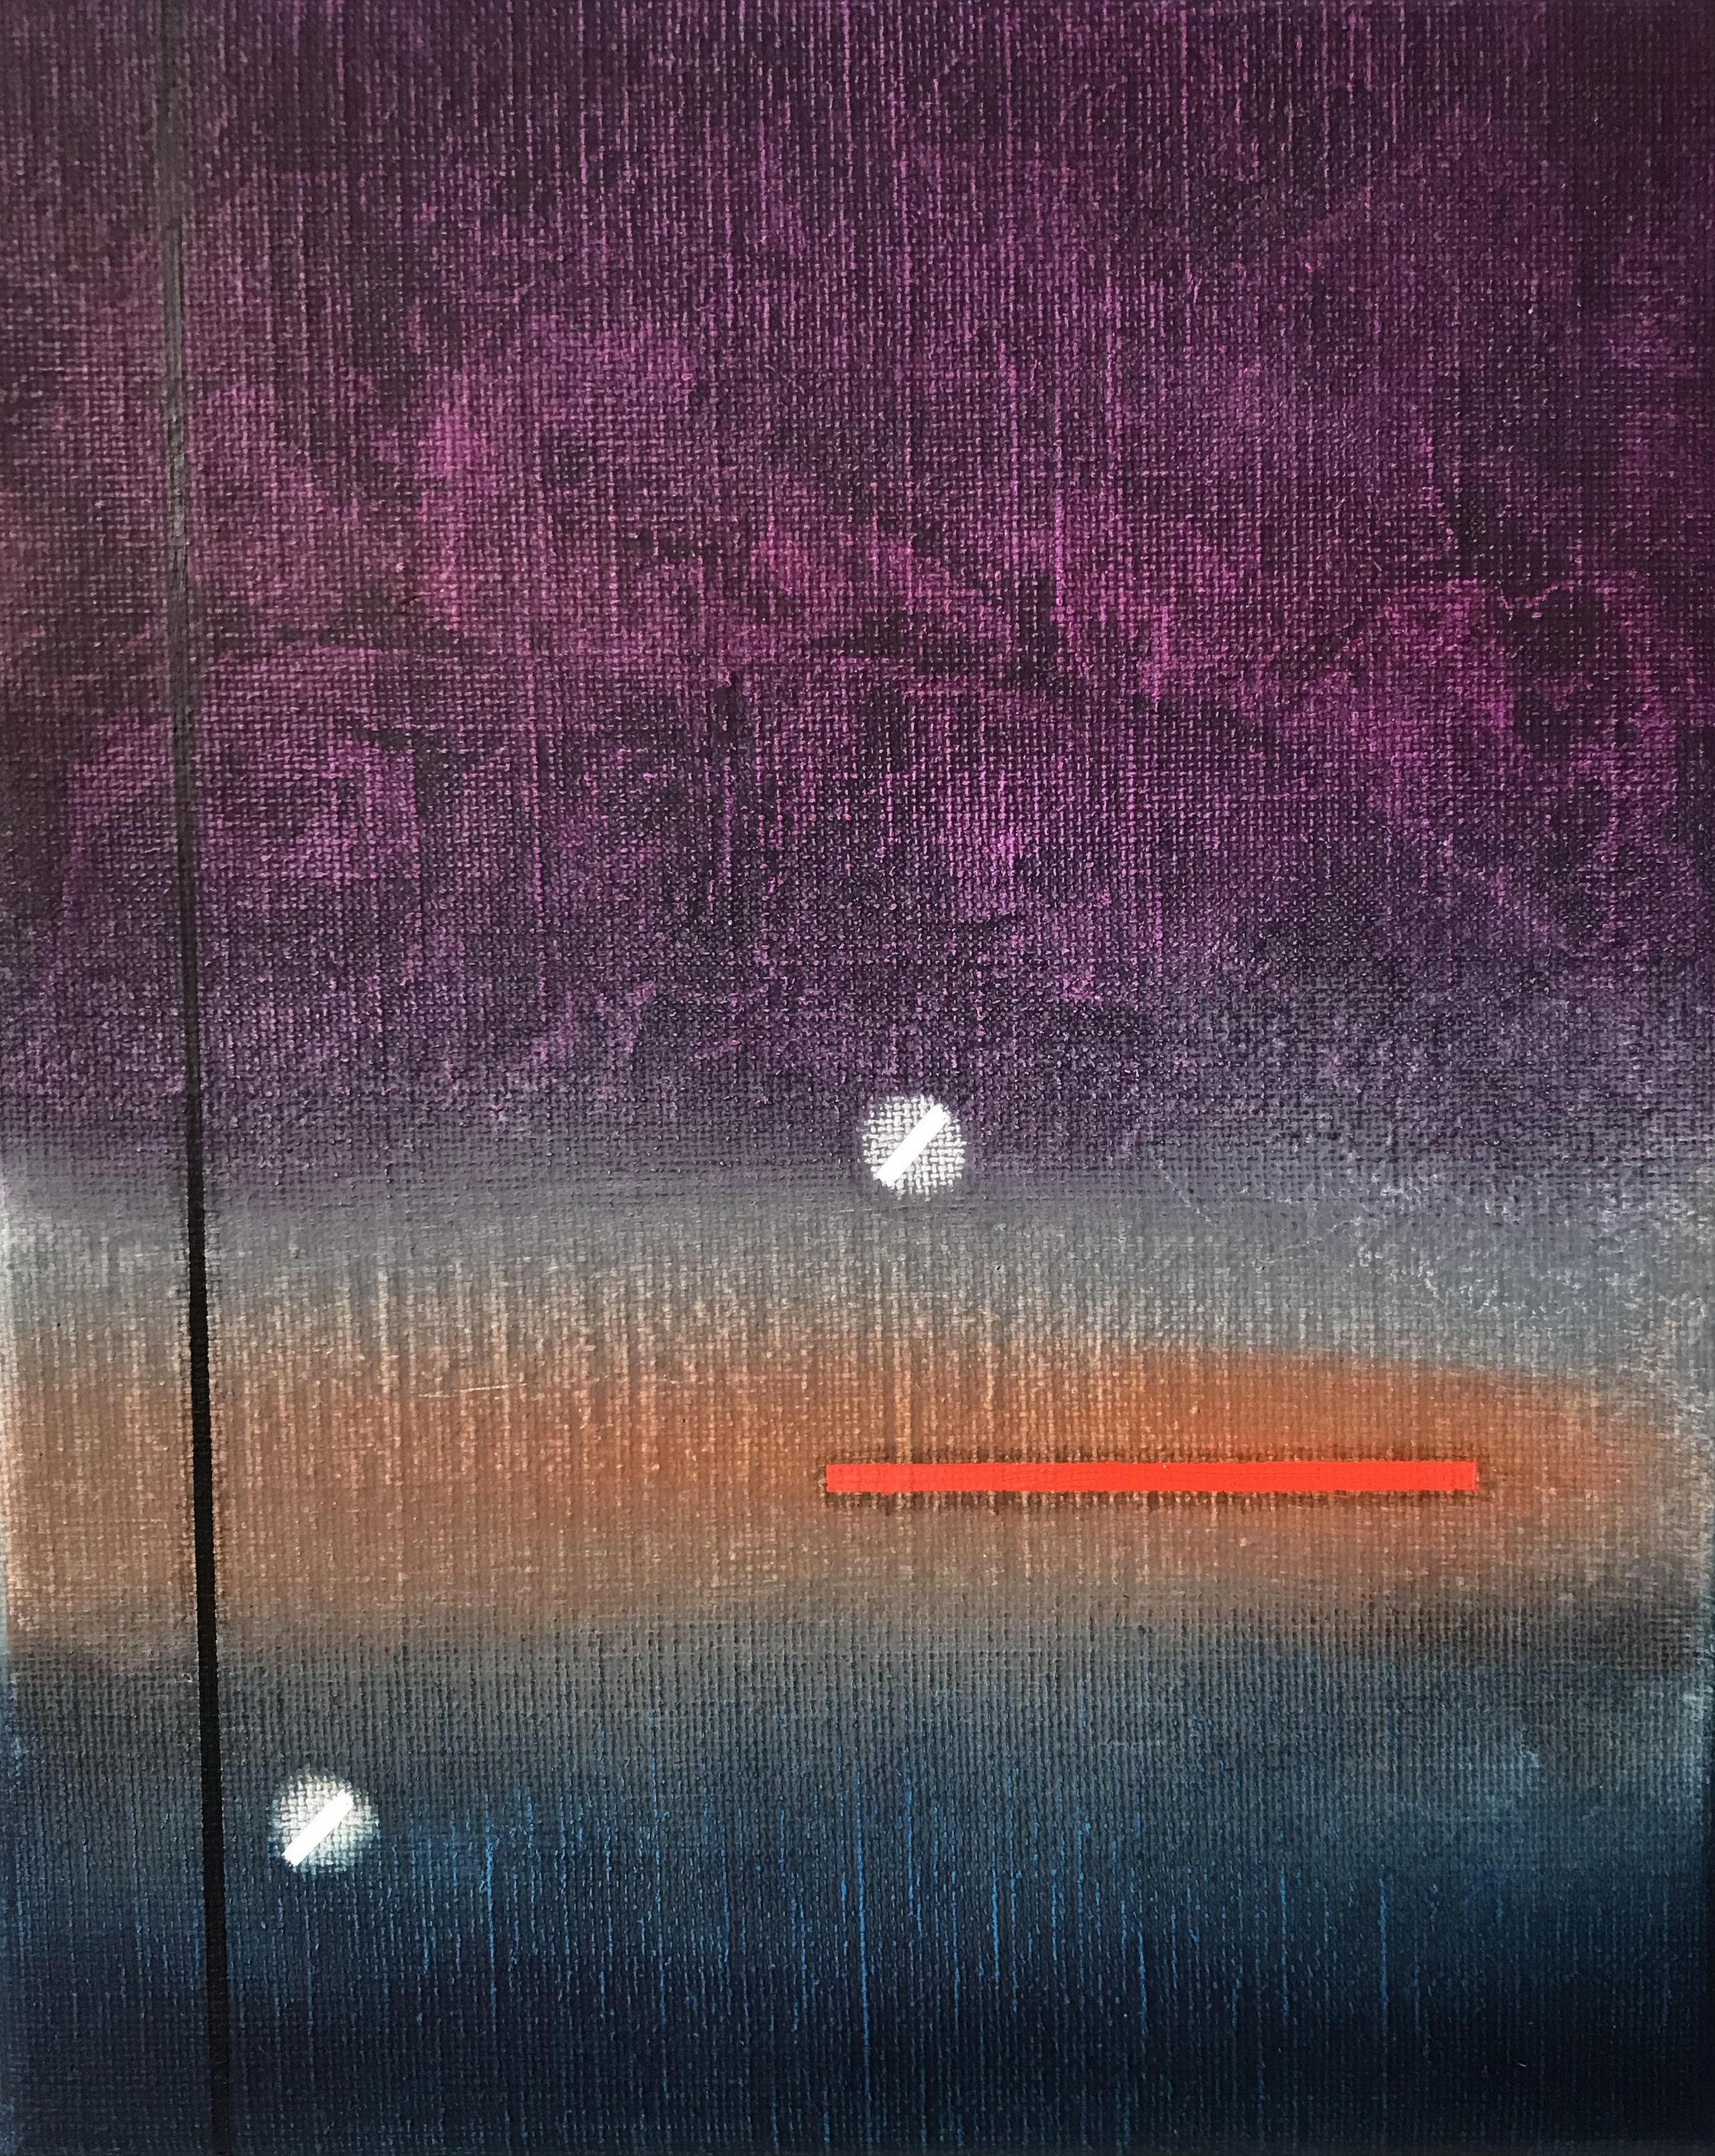 Miquel Gelabert: Strangers in the Night 2 oil on canvas, 10.75 x 8.5 in., 2018